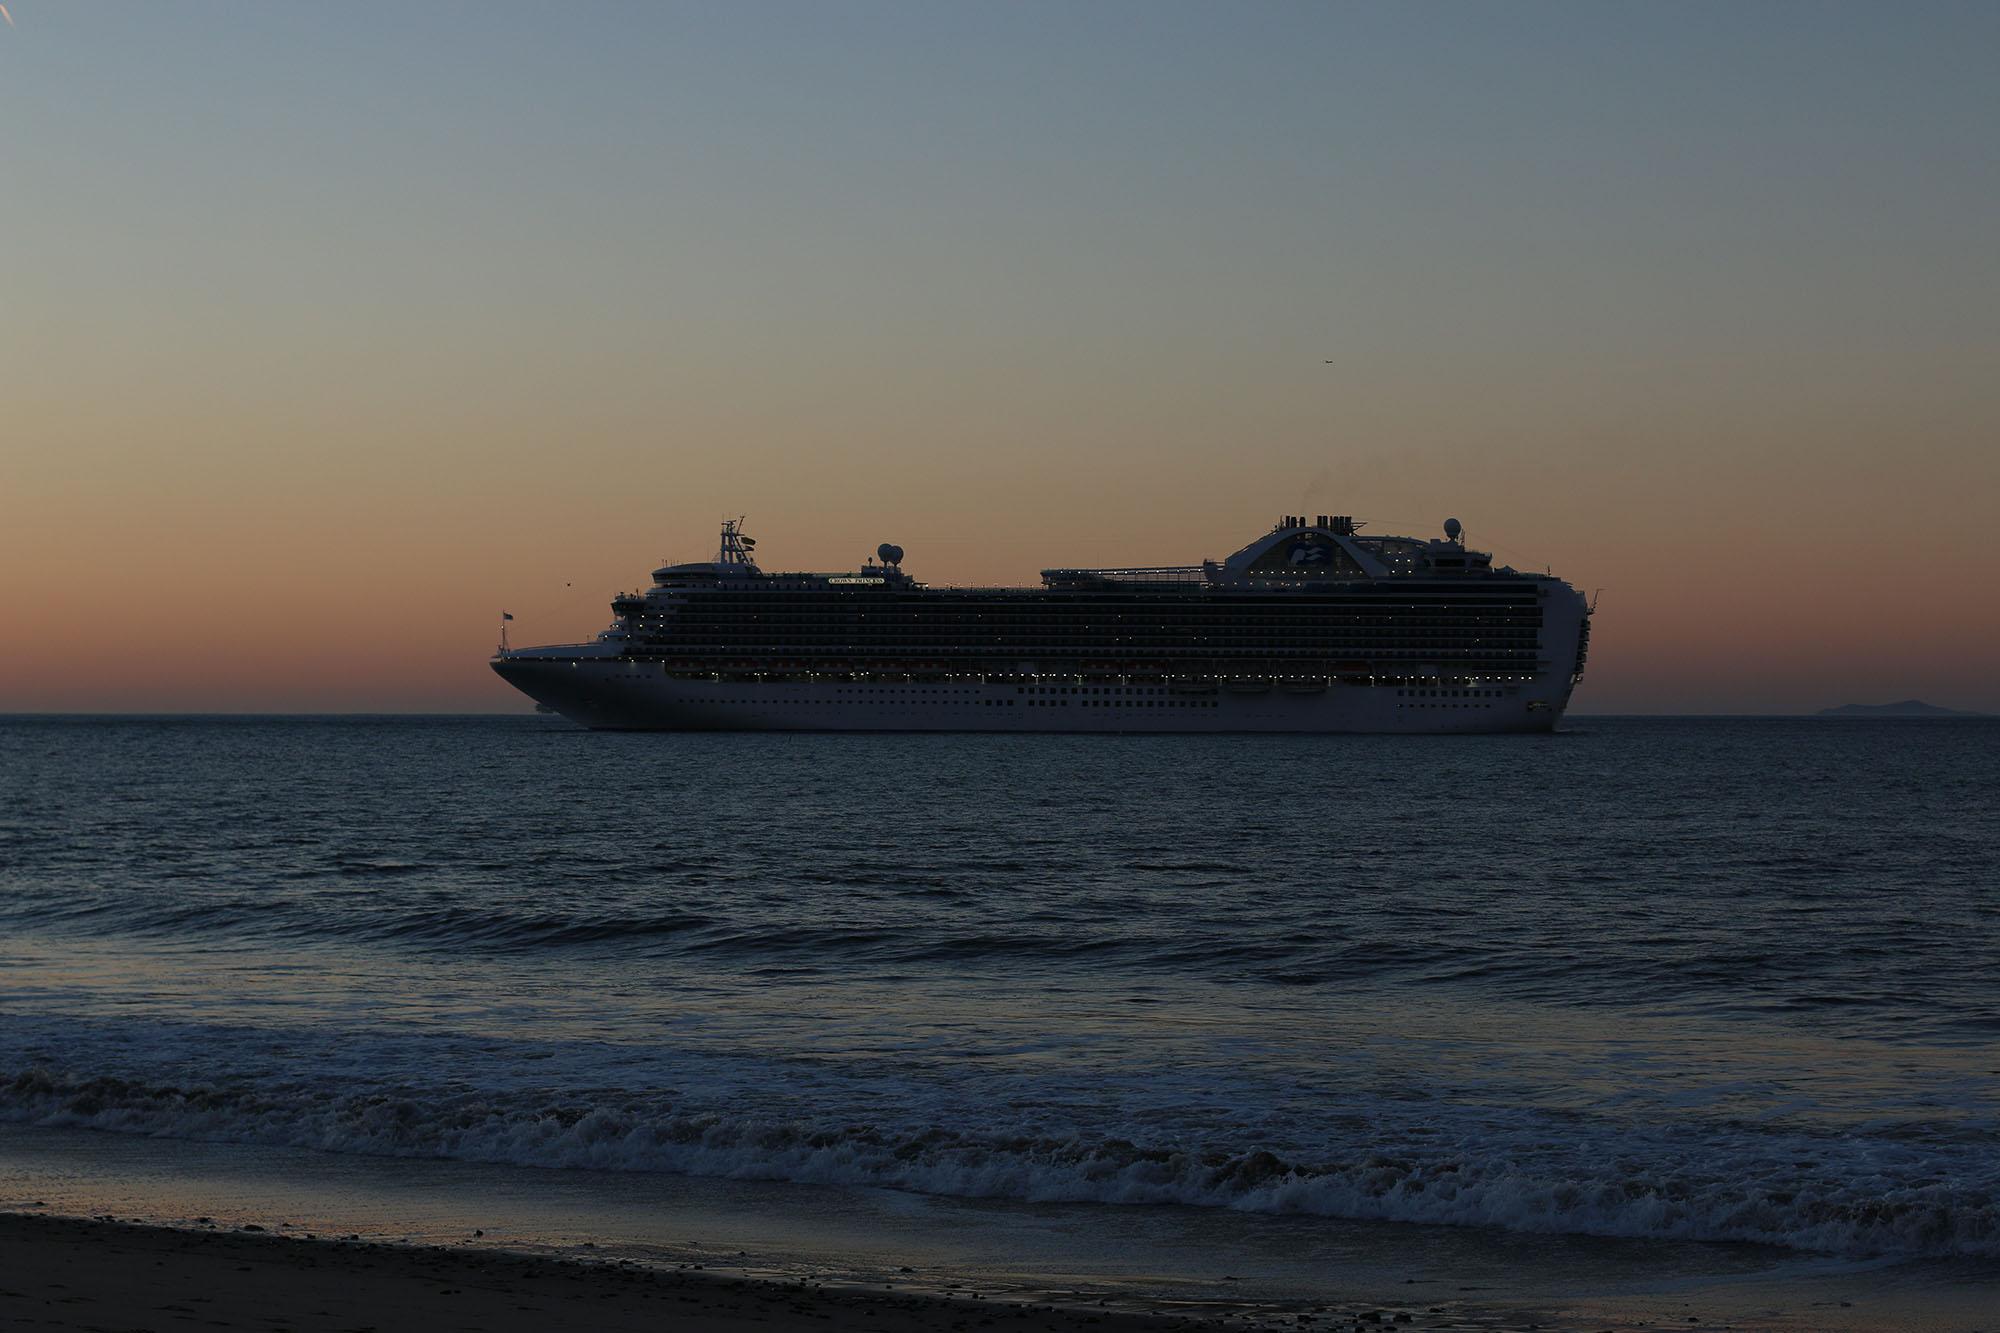 IMG_1401 soluppgång skepp x